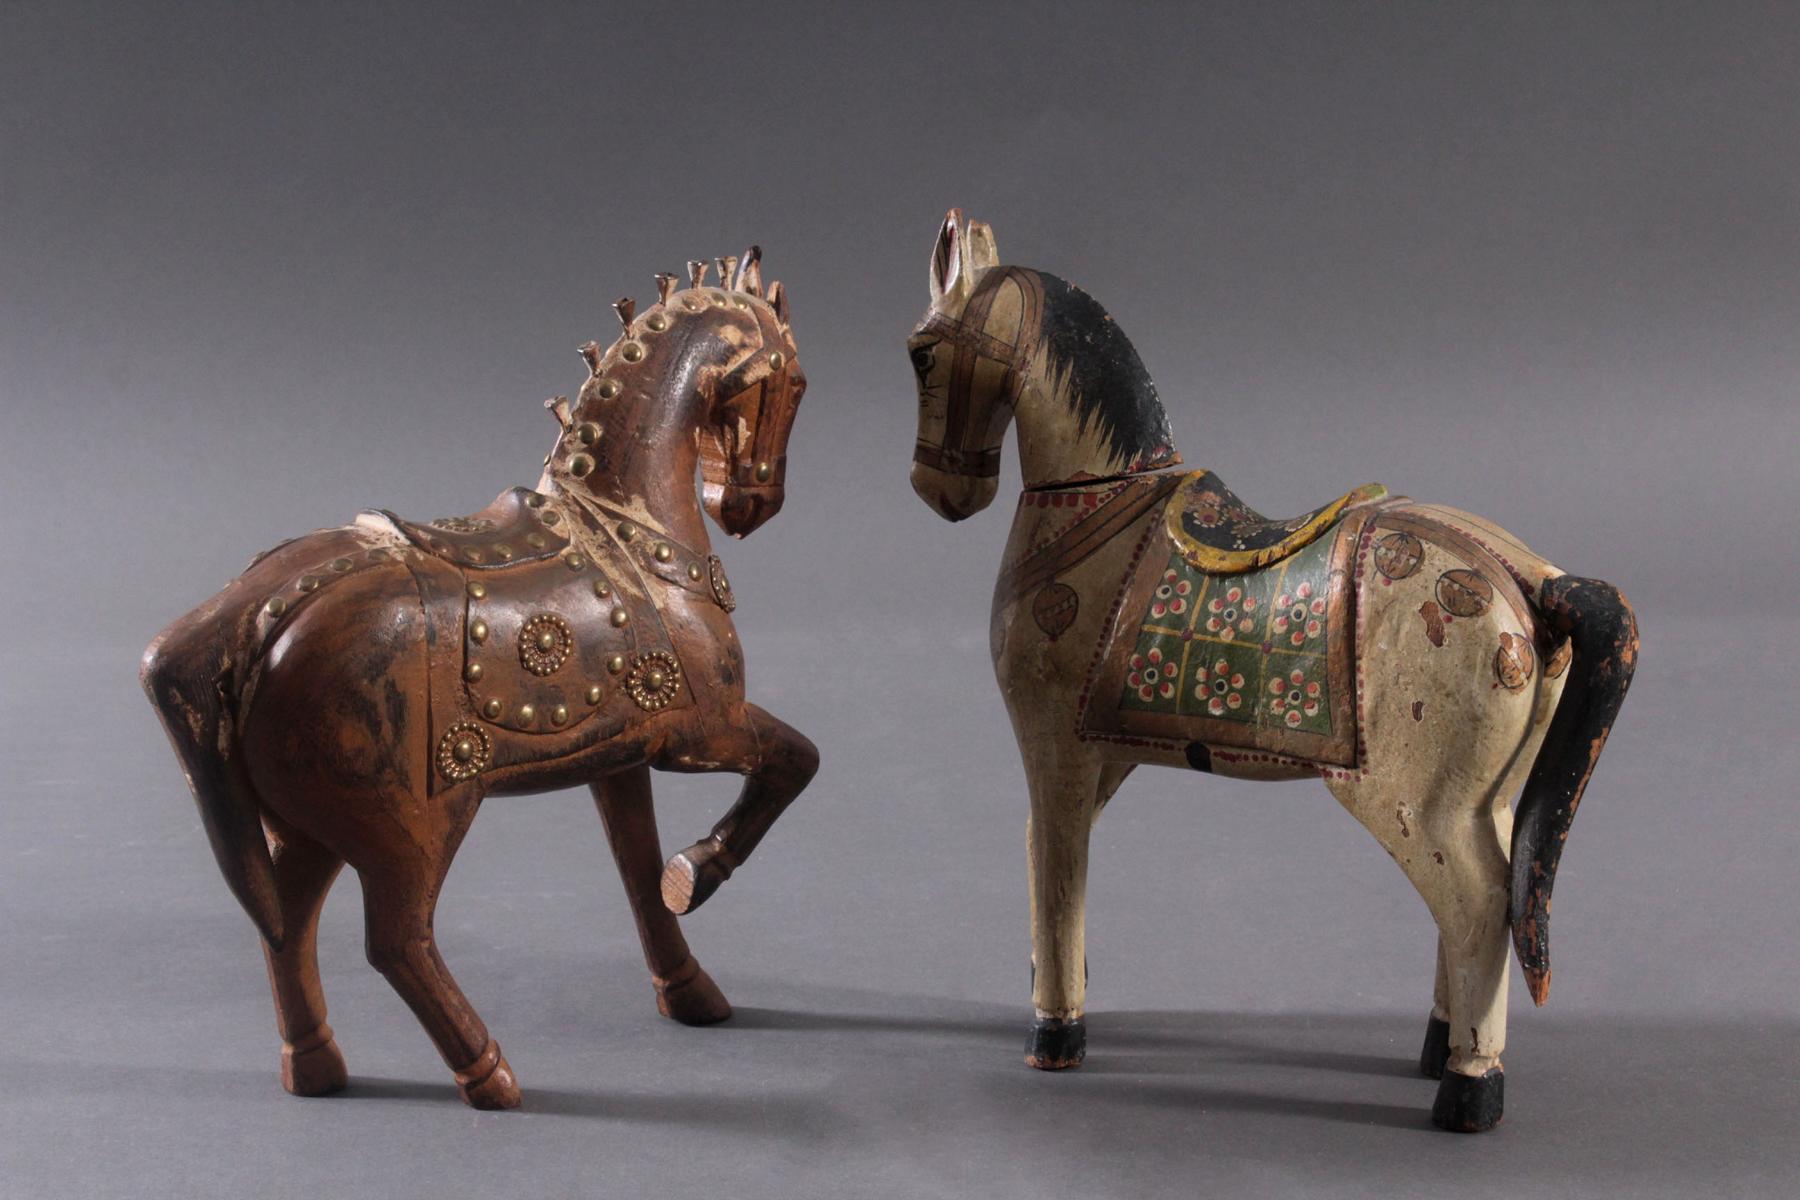 2 Pferdeskulpturen aus Holz 1. Hälfte 20. Jh.-4